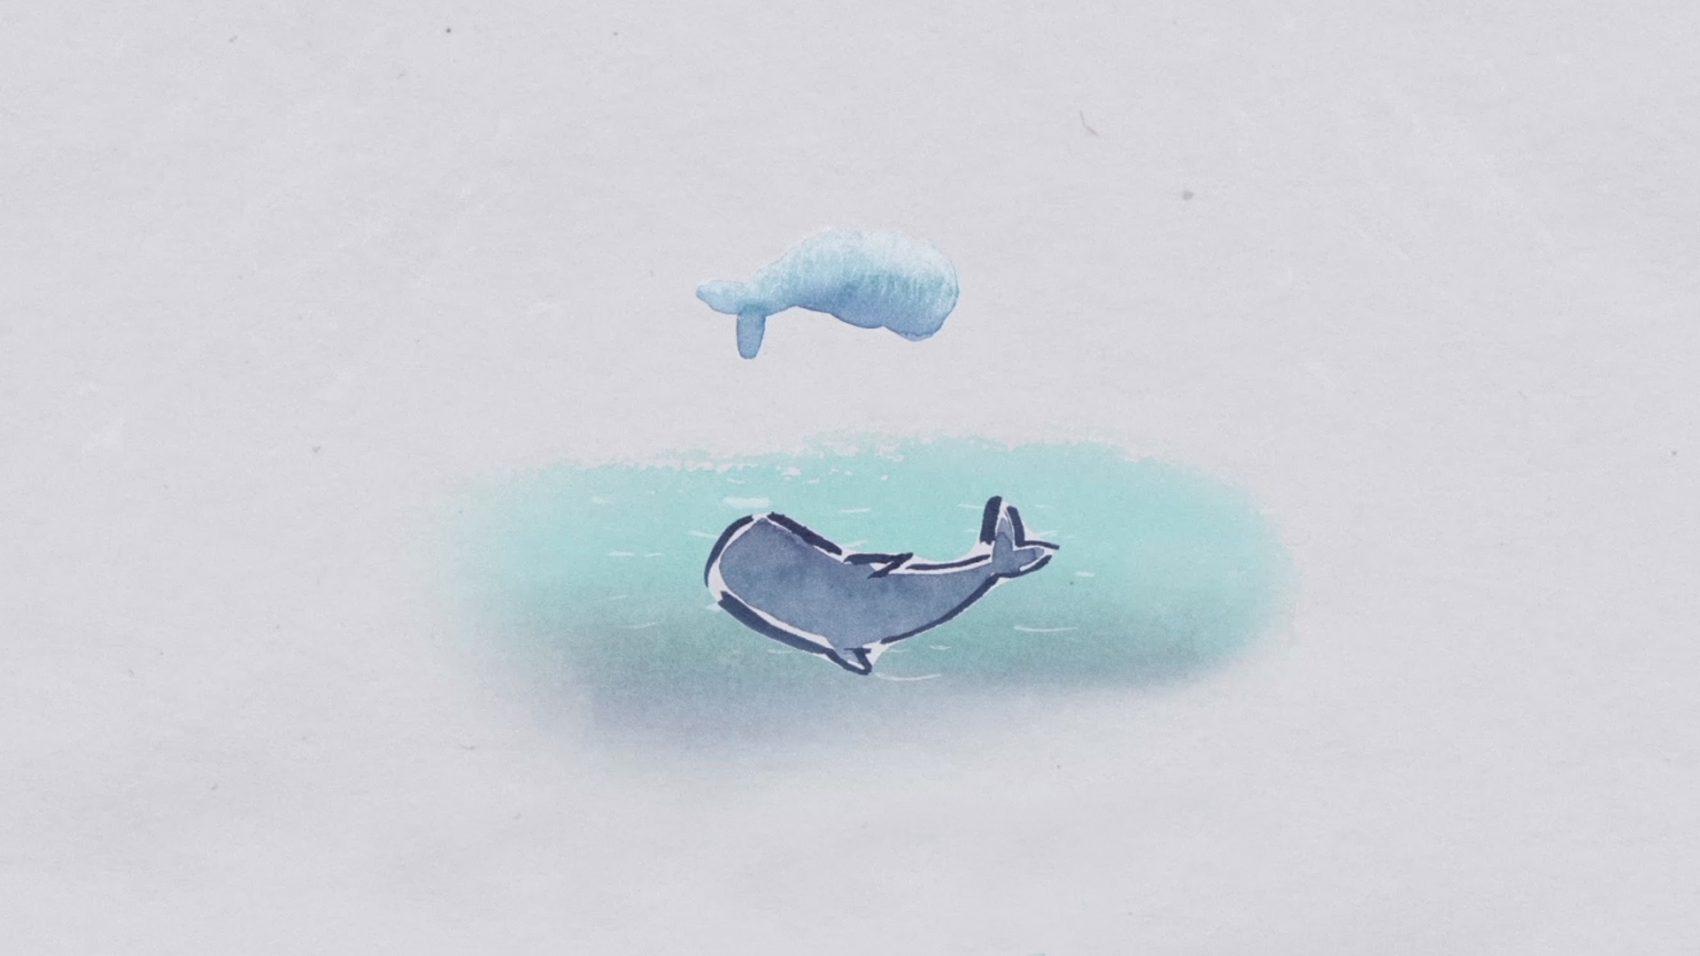 ТYЧKA И KИT (The Cloud and the Whale)